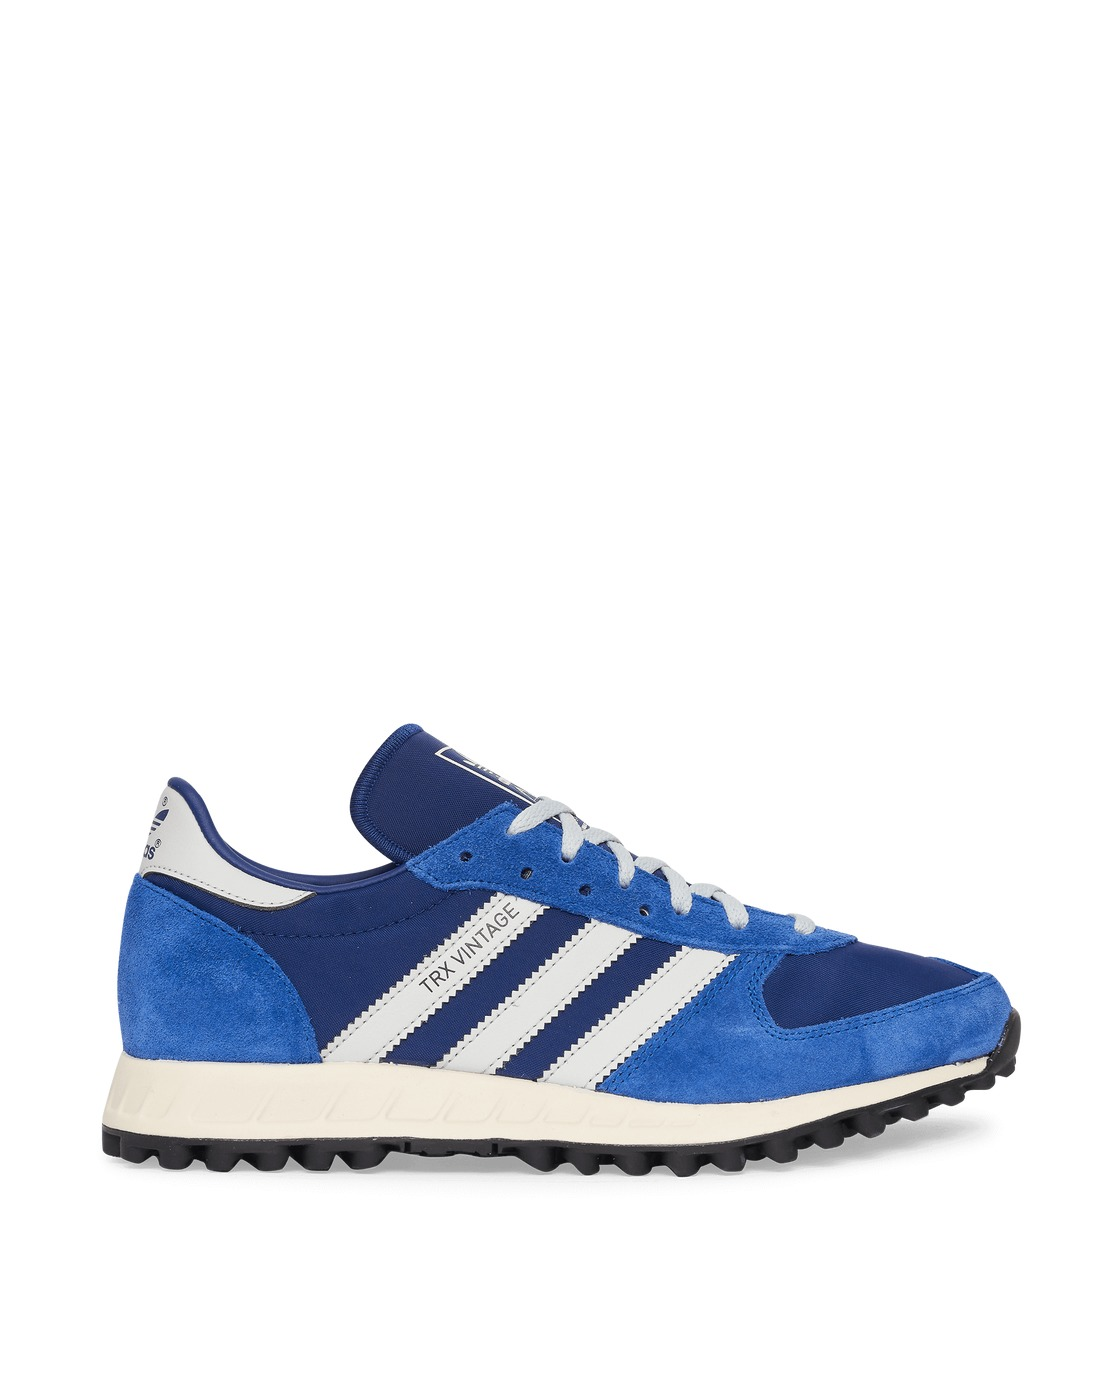 Adidas Originals Trx Vintage Sneakers Cwhite/Clgrey